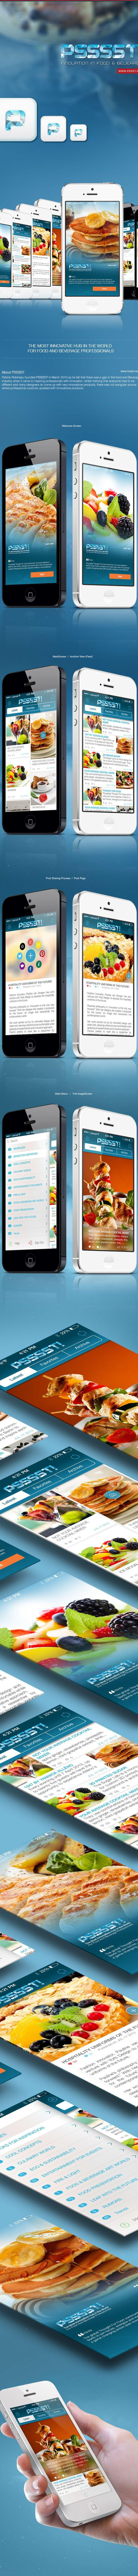 PSSSST! Mobile App by Ayman Shaltoni, via Behance